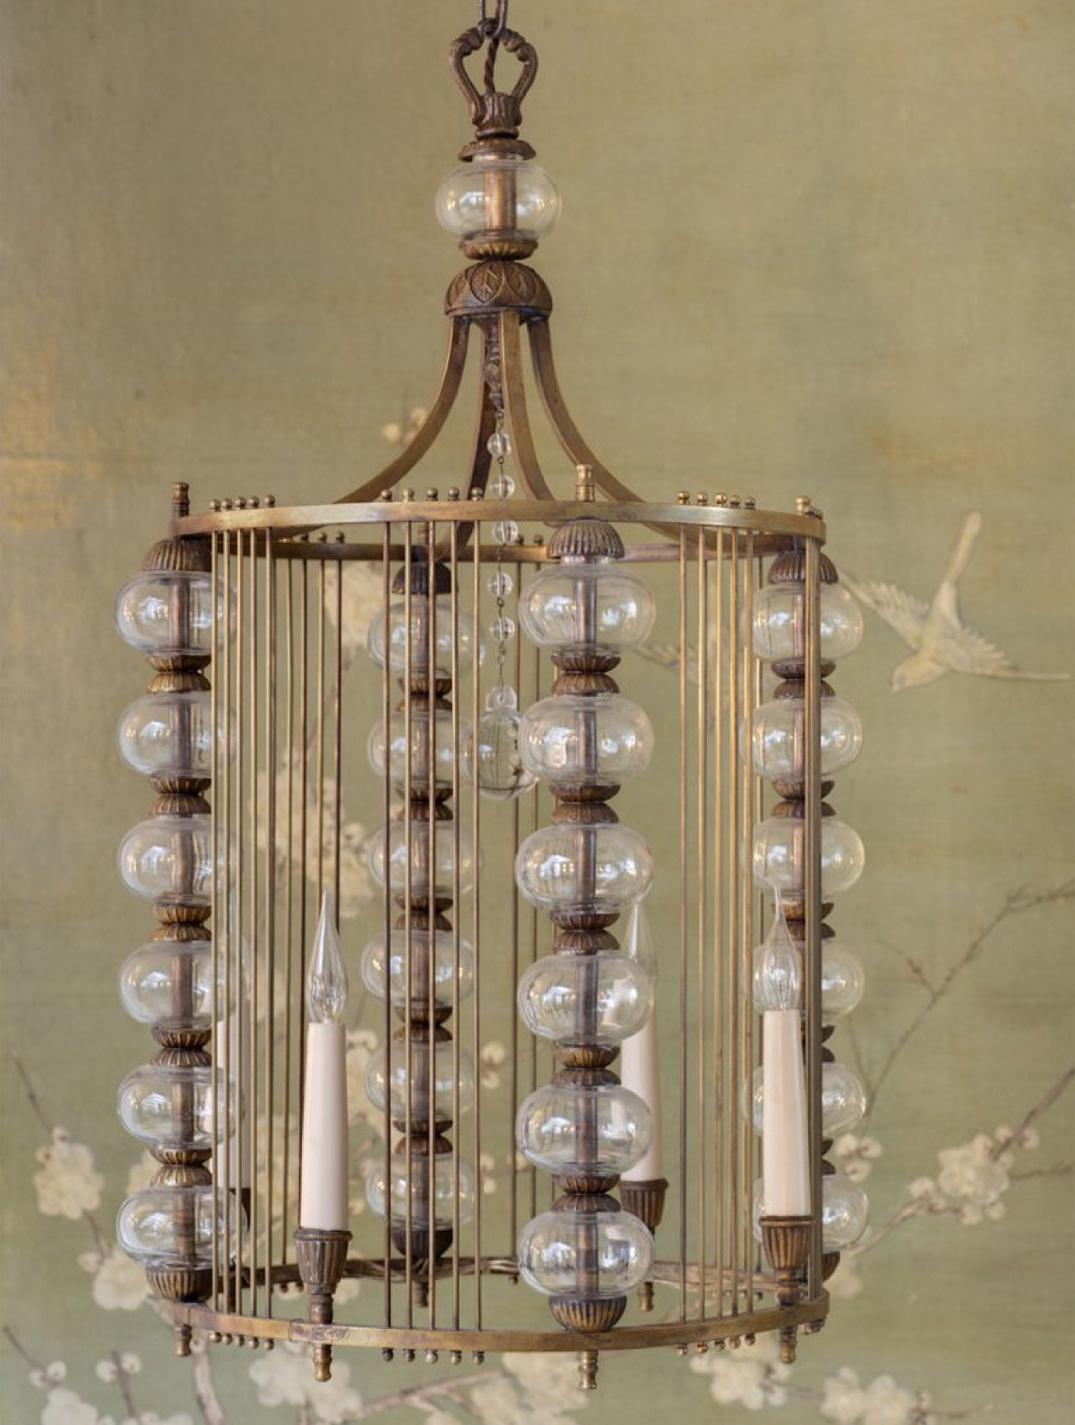 Spanish brass and glass hanging lantern.